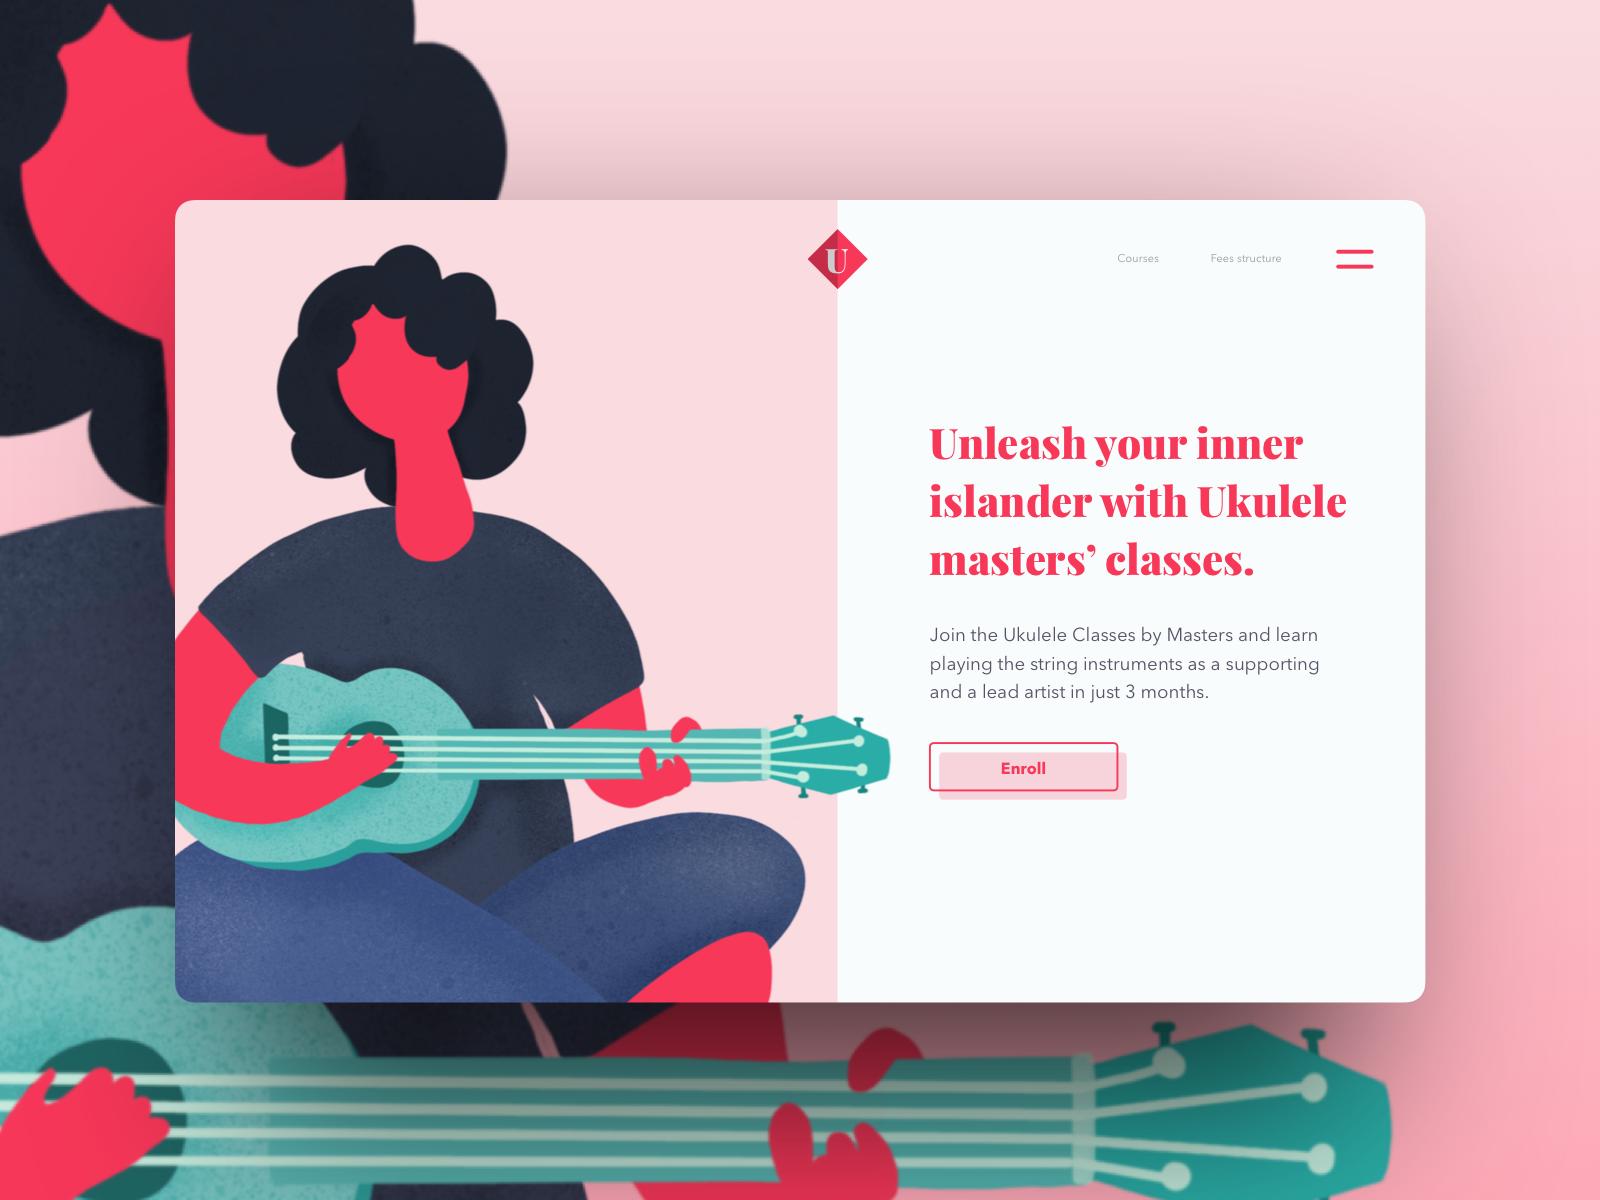 Day 9 part 2 - Concept UI for a string player classes concept sketch ukulele ui landingpage web guitar string